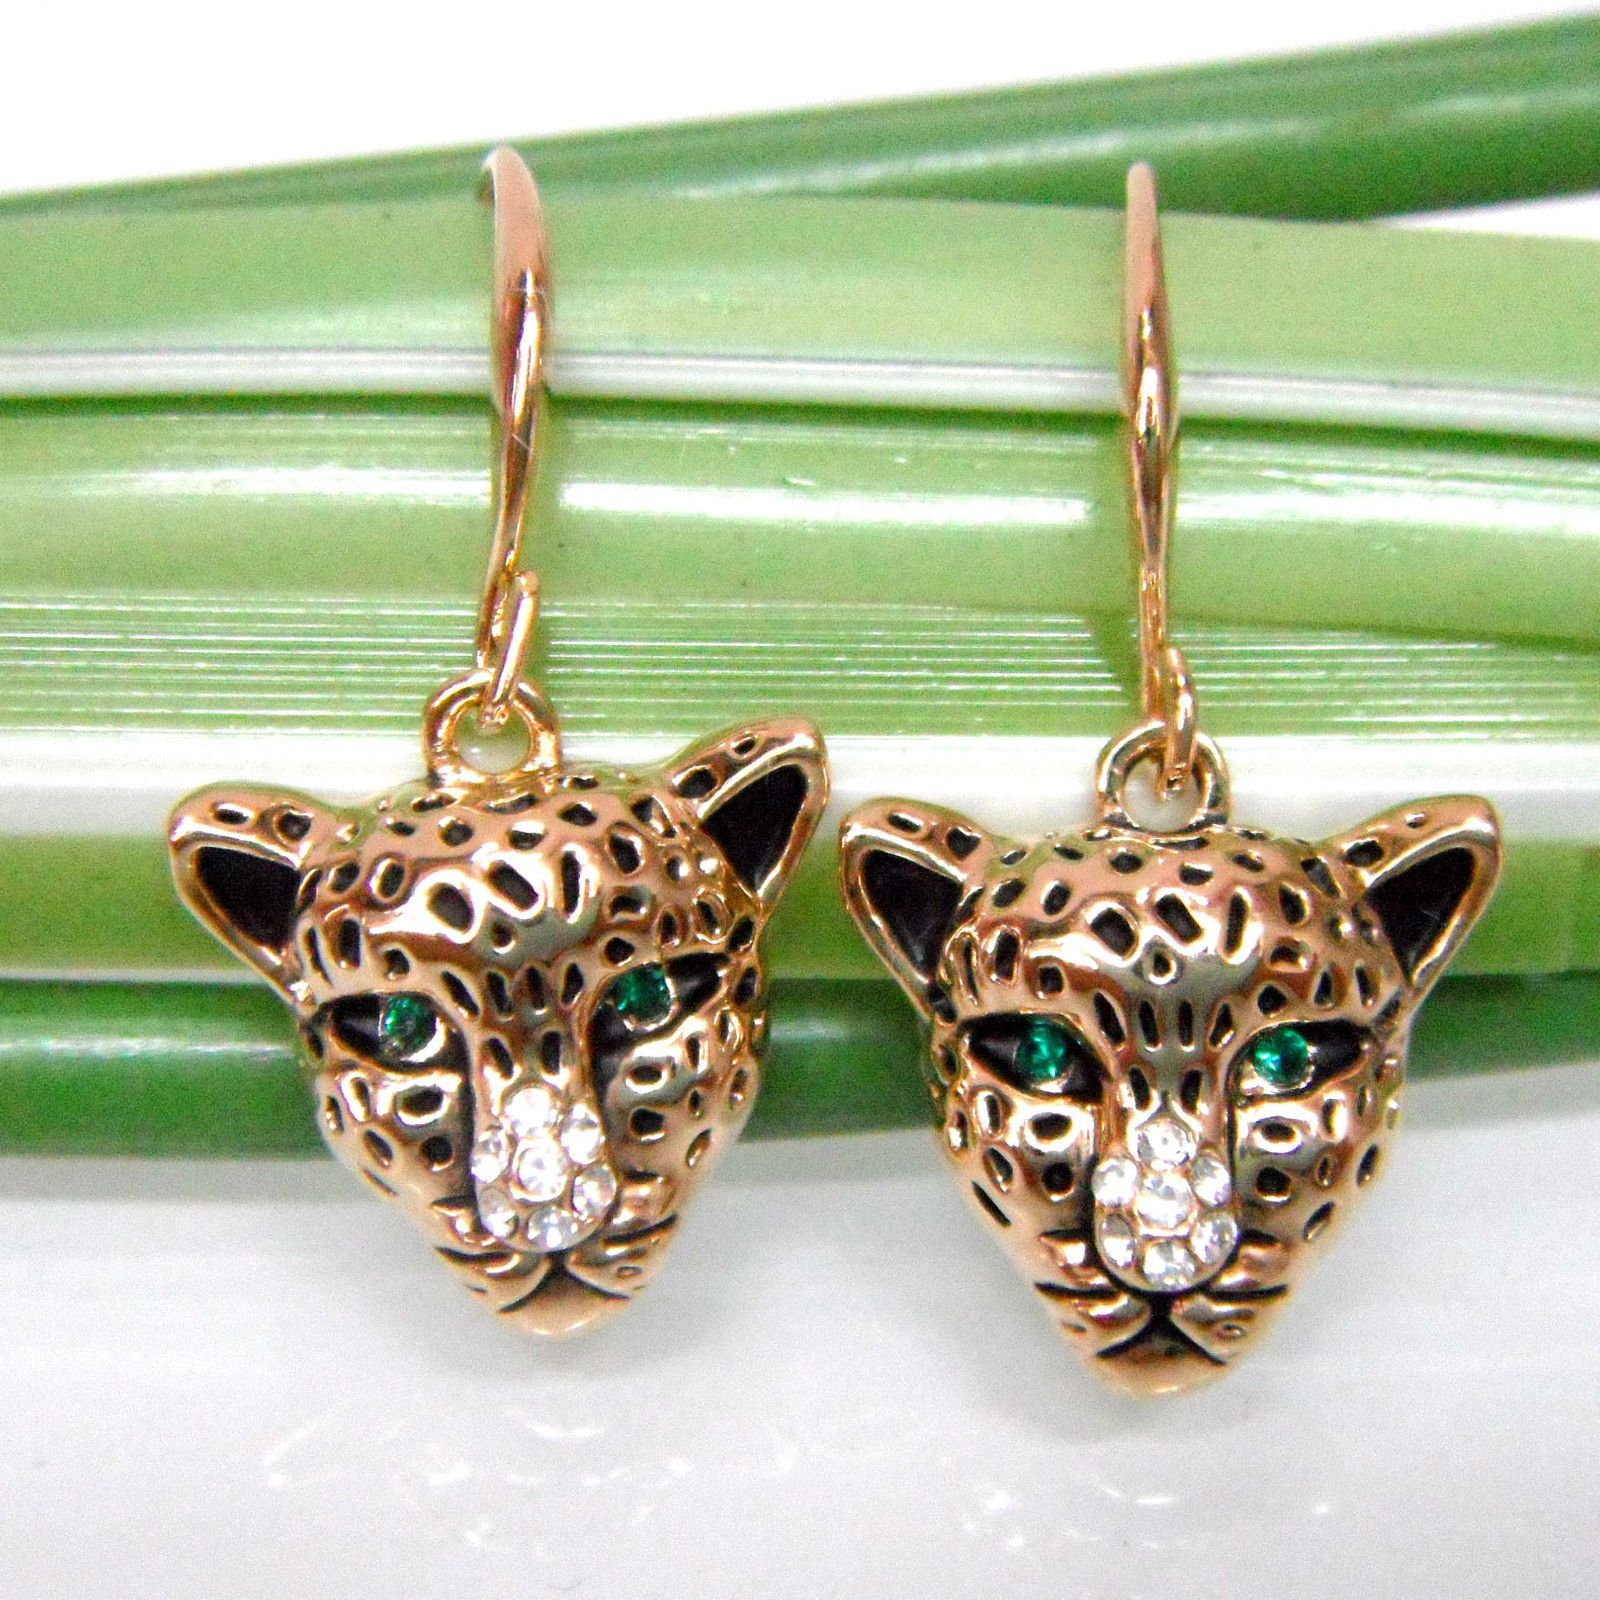 8ad4ea292 18K Gp Cheetah Leopard Head Rhinestone Crystal Earrings Ear Nail E1384